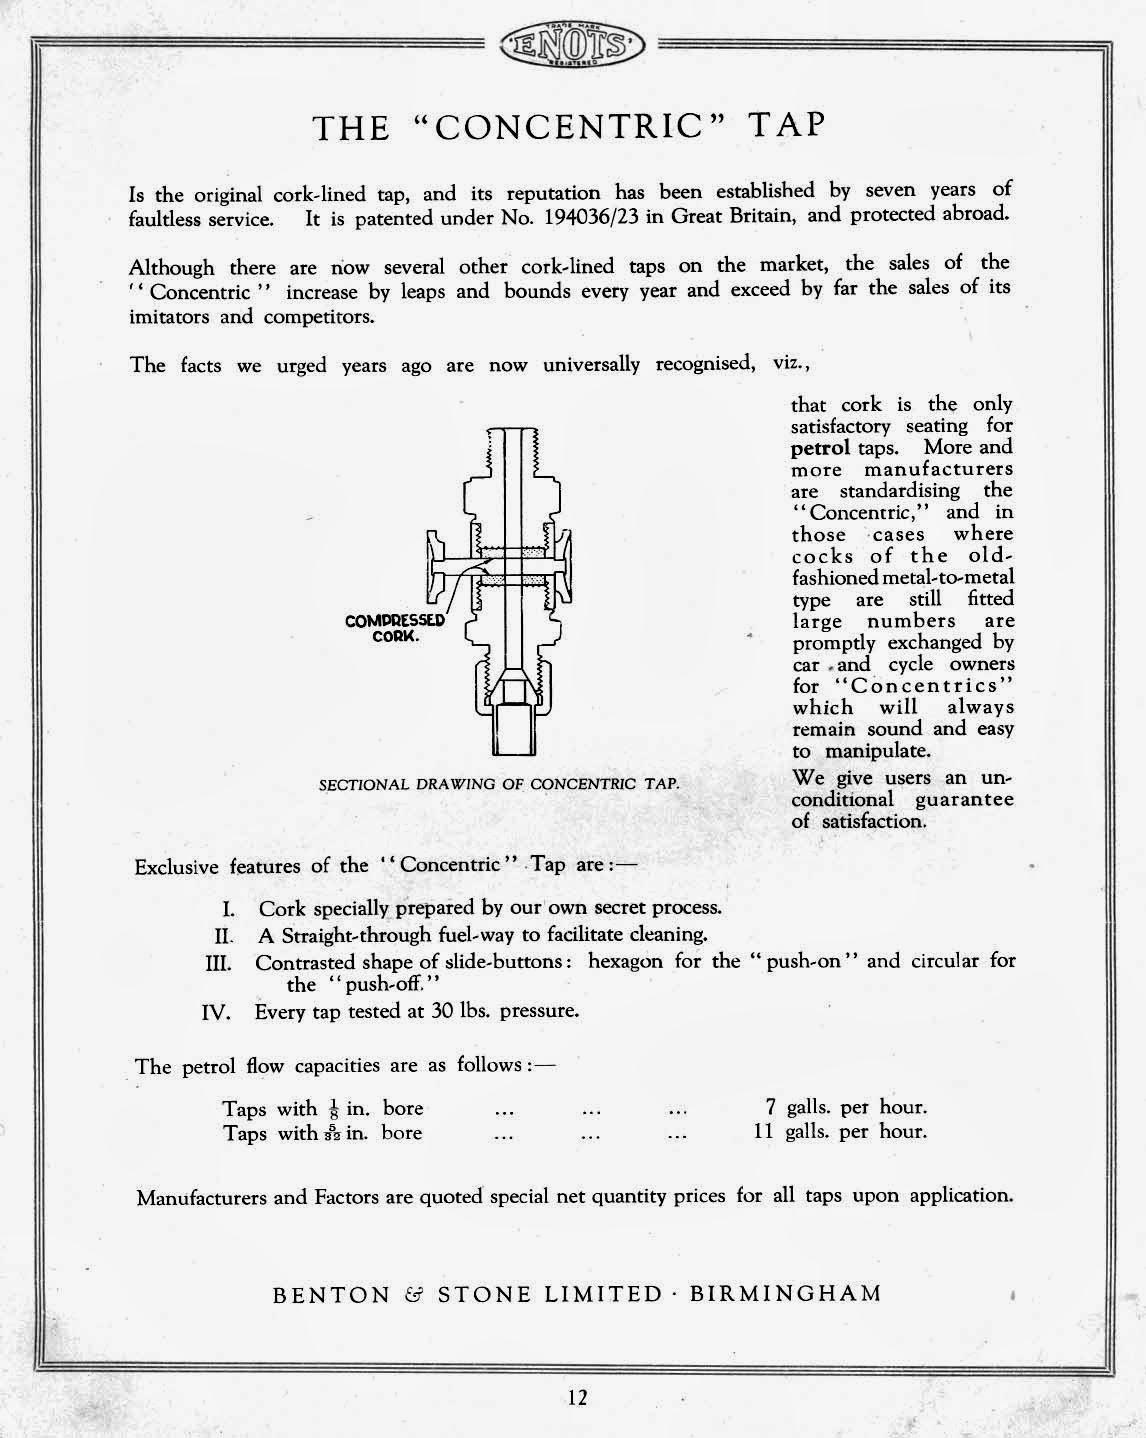 The Velobanjogent A Look At A Enots Benton Amp Stone